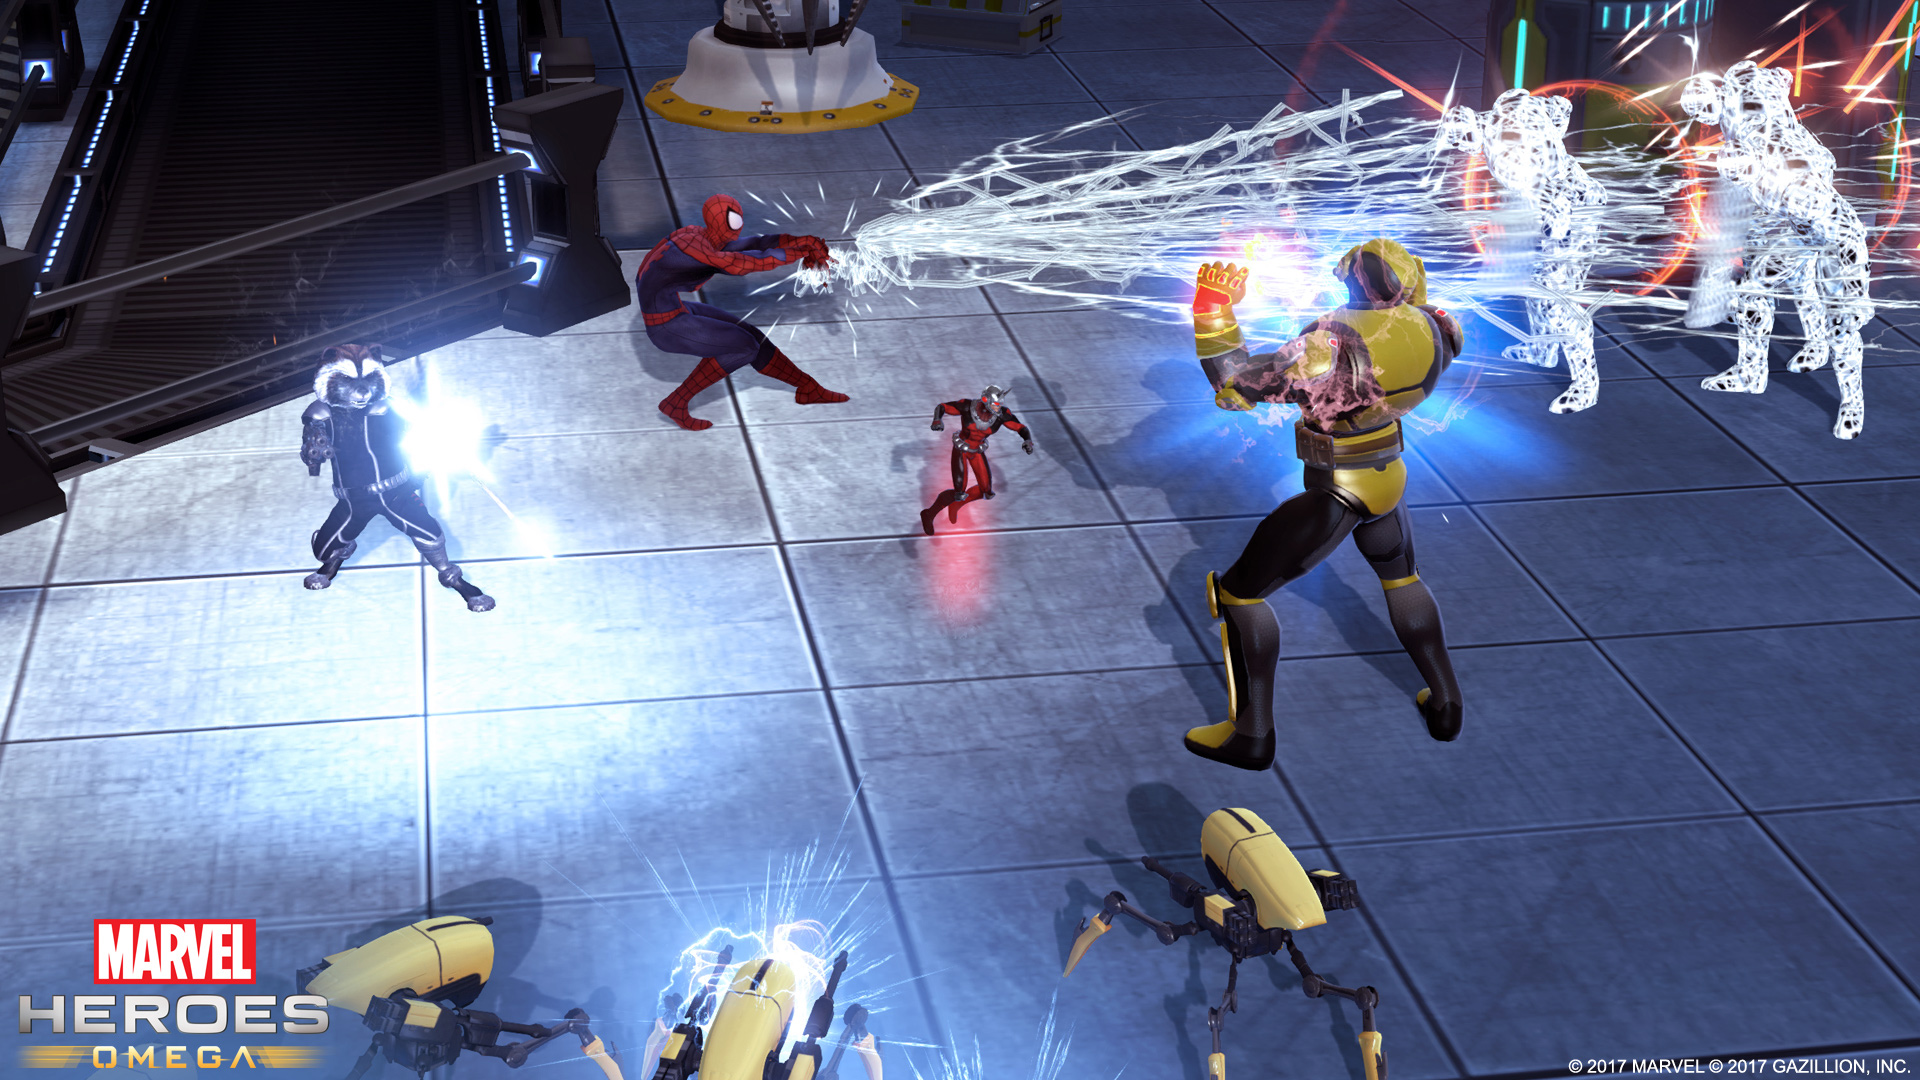 The Marvel Heroes Omega open beta hits PS4 tomorrow screenshot